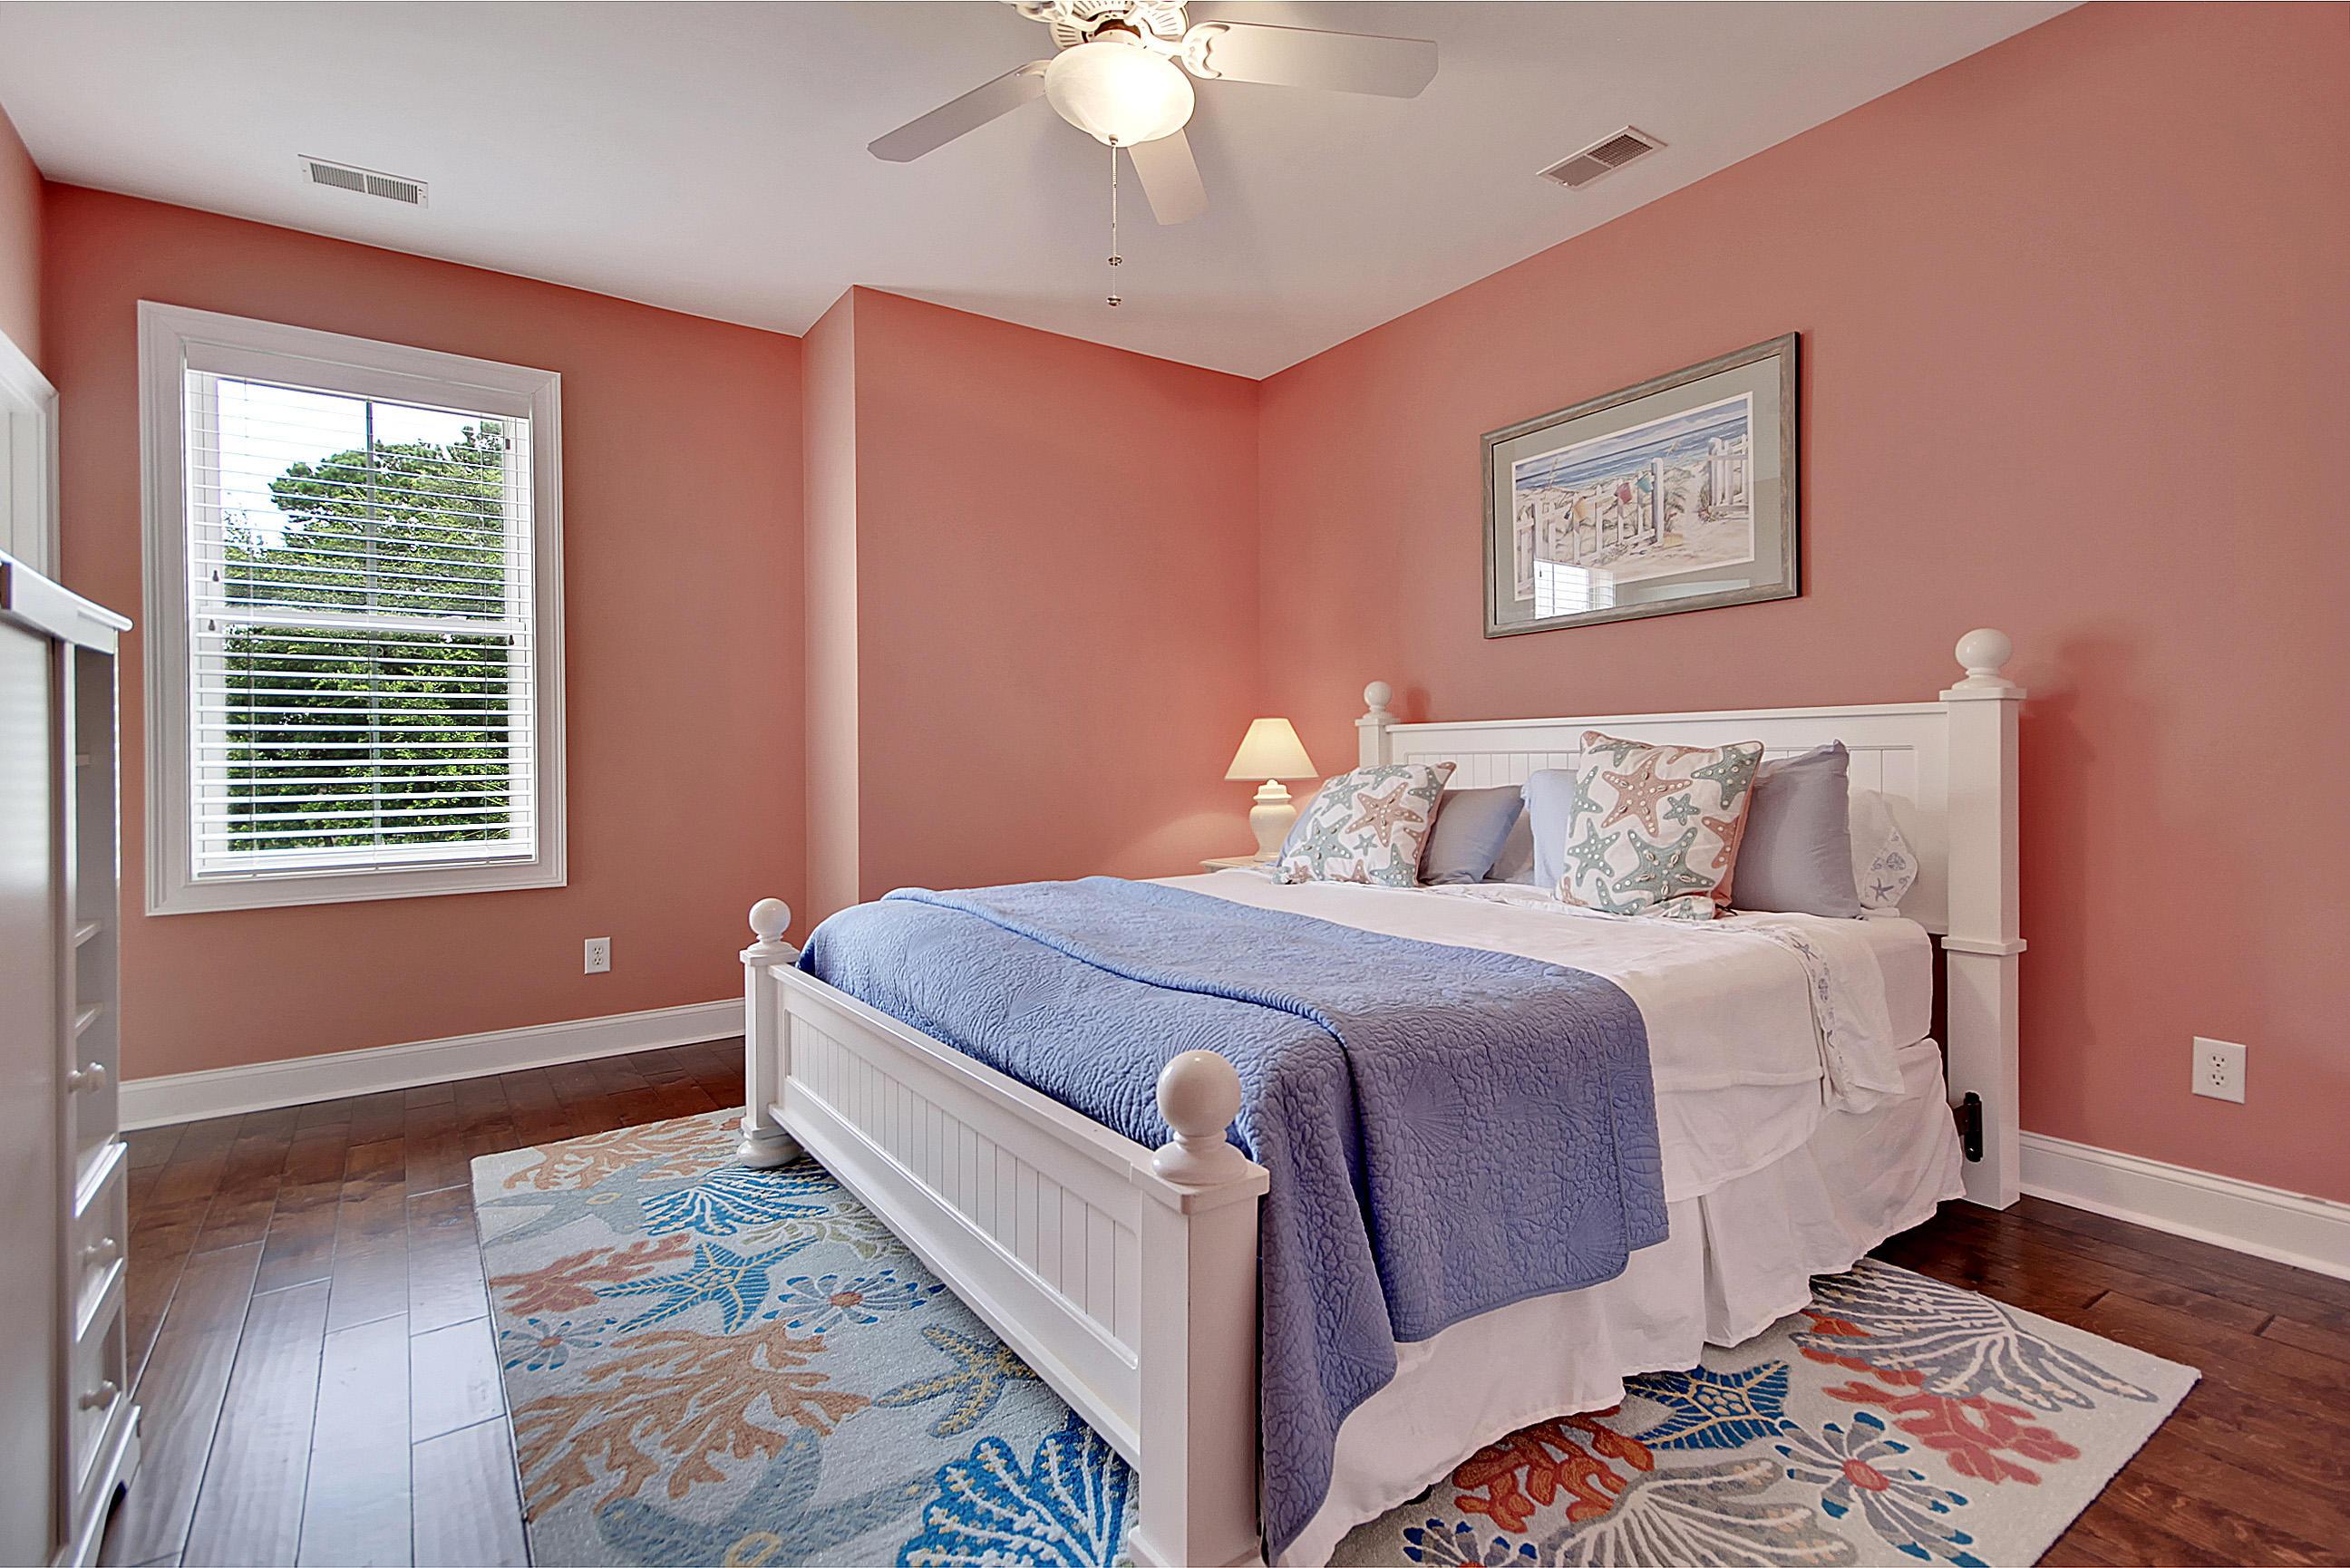 Belle Hall Homes For Sale - 368 Evian, Mount Pleasant, SC - 32